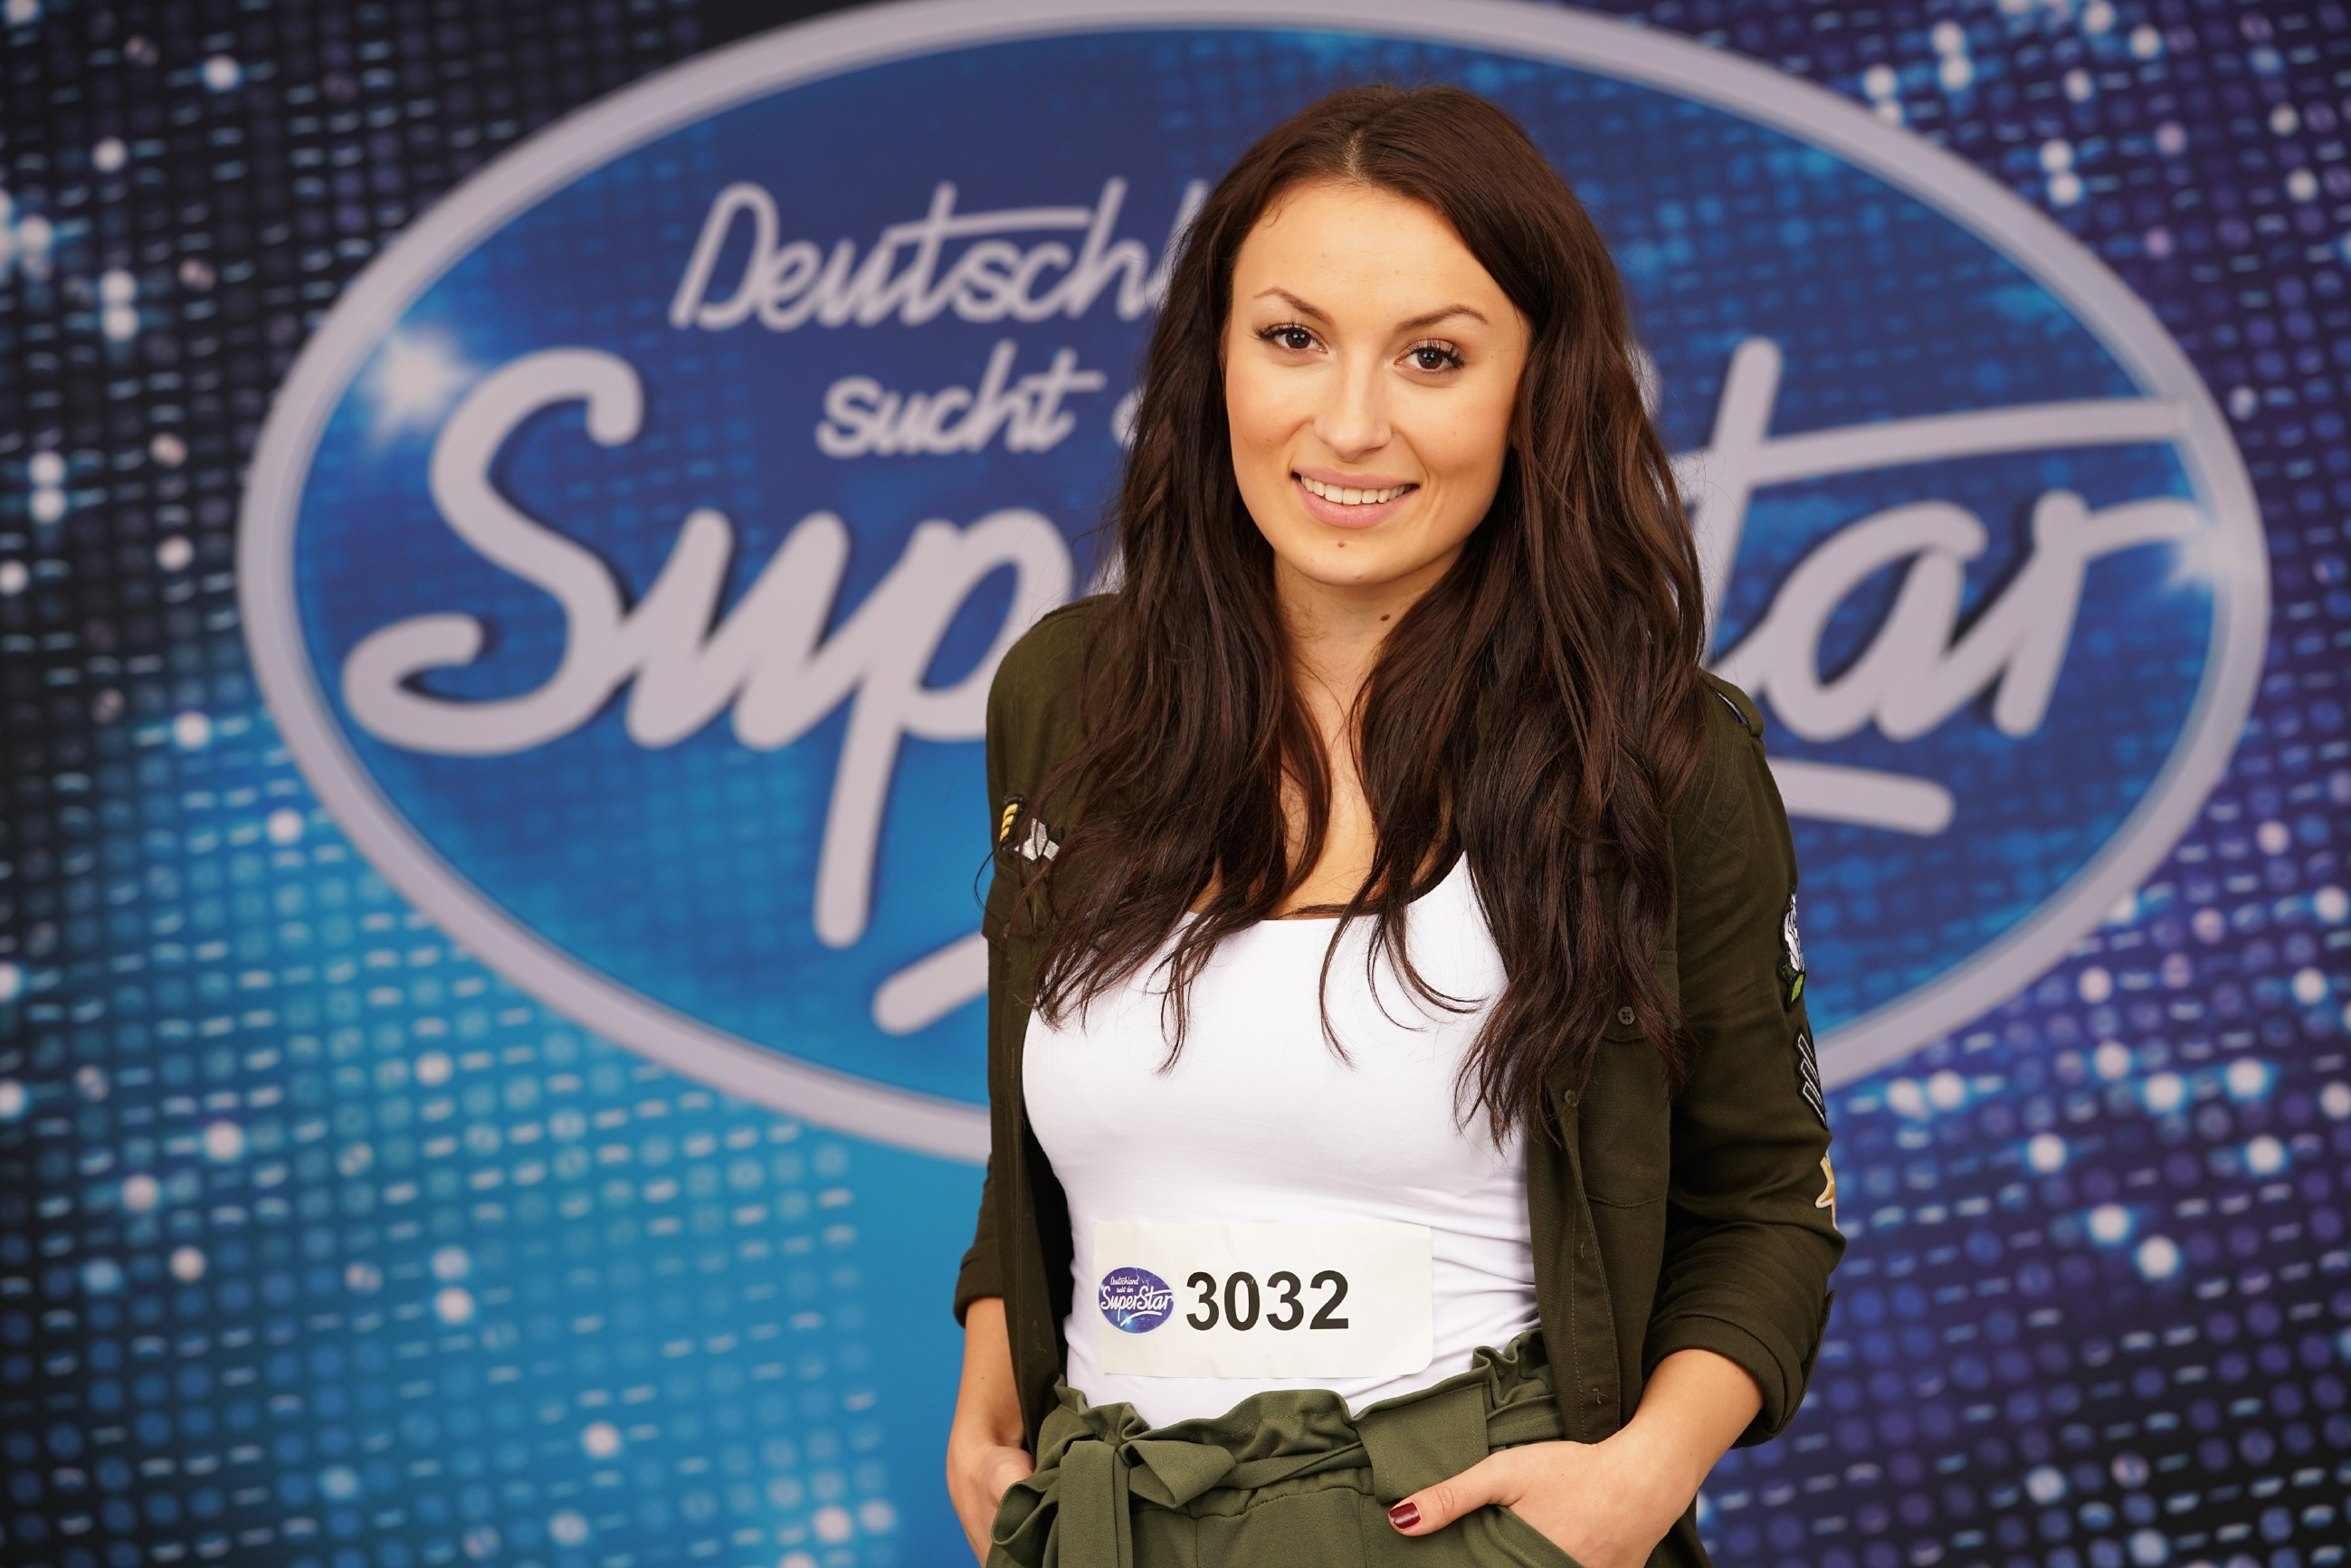 DSDS 2018 TOP 24 - Mia Gucek